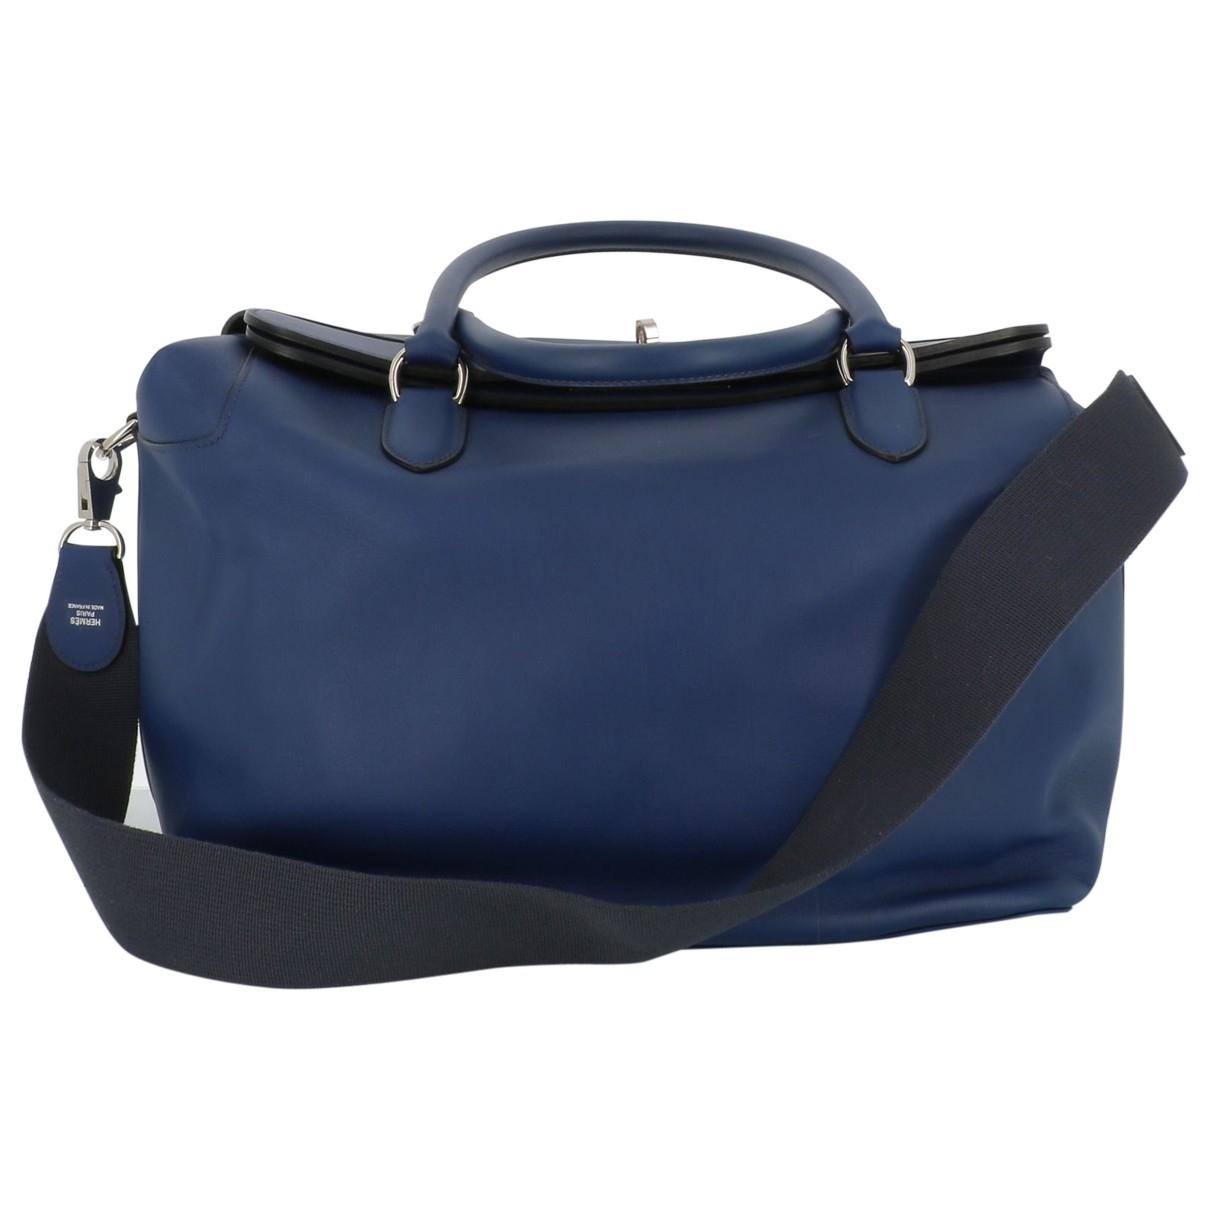 Hermès \N Blue Leather handbag for Women \N